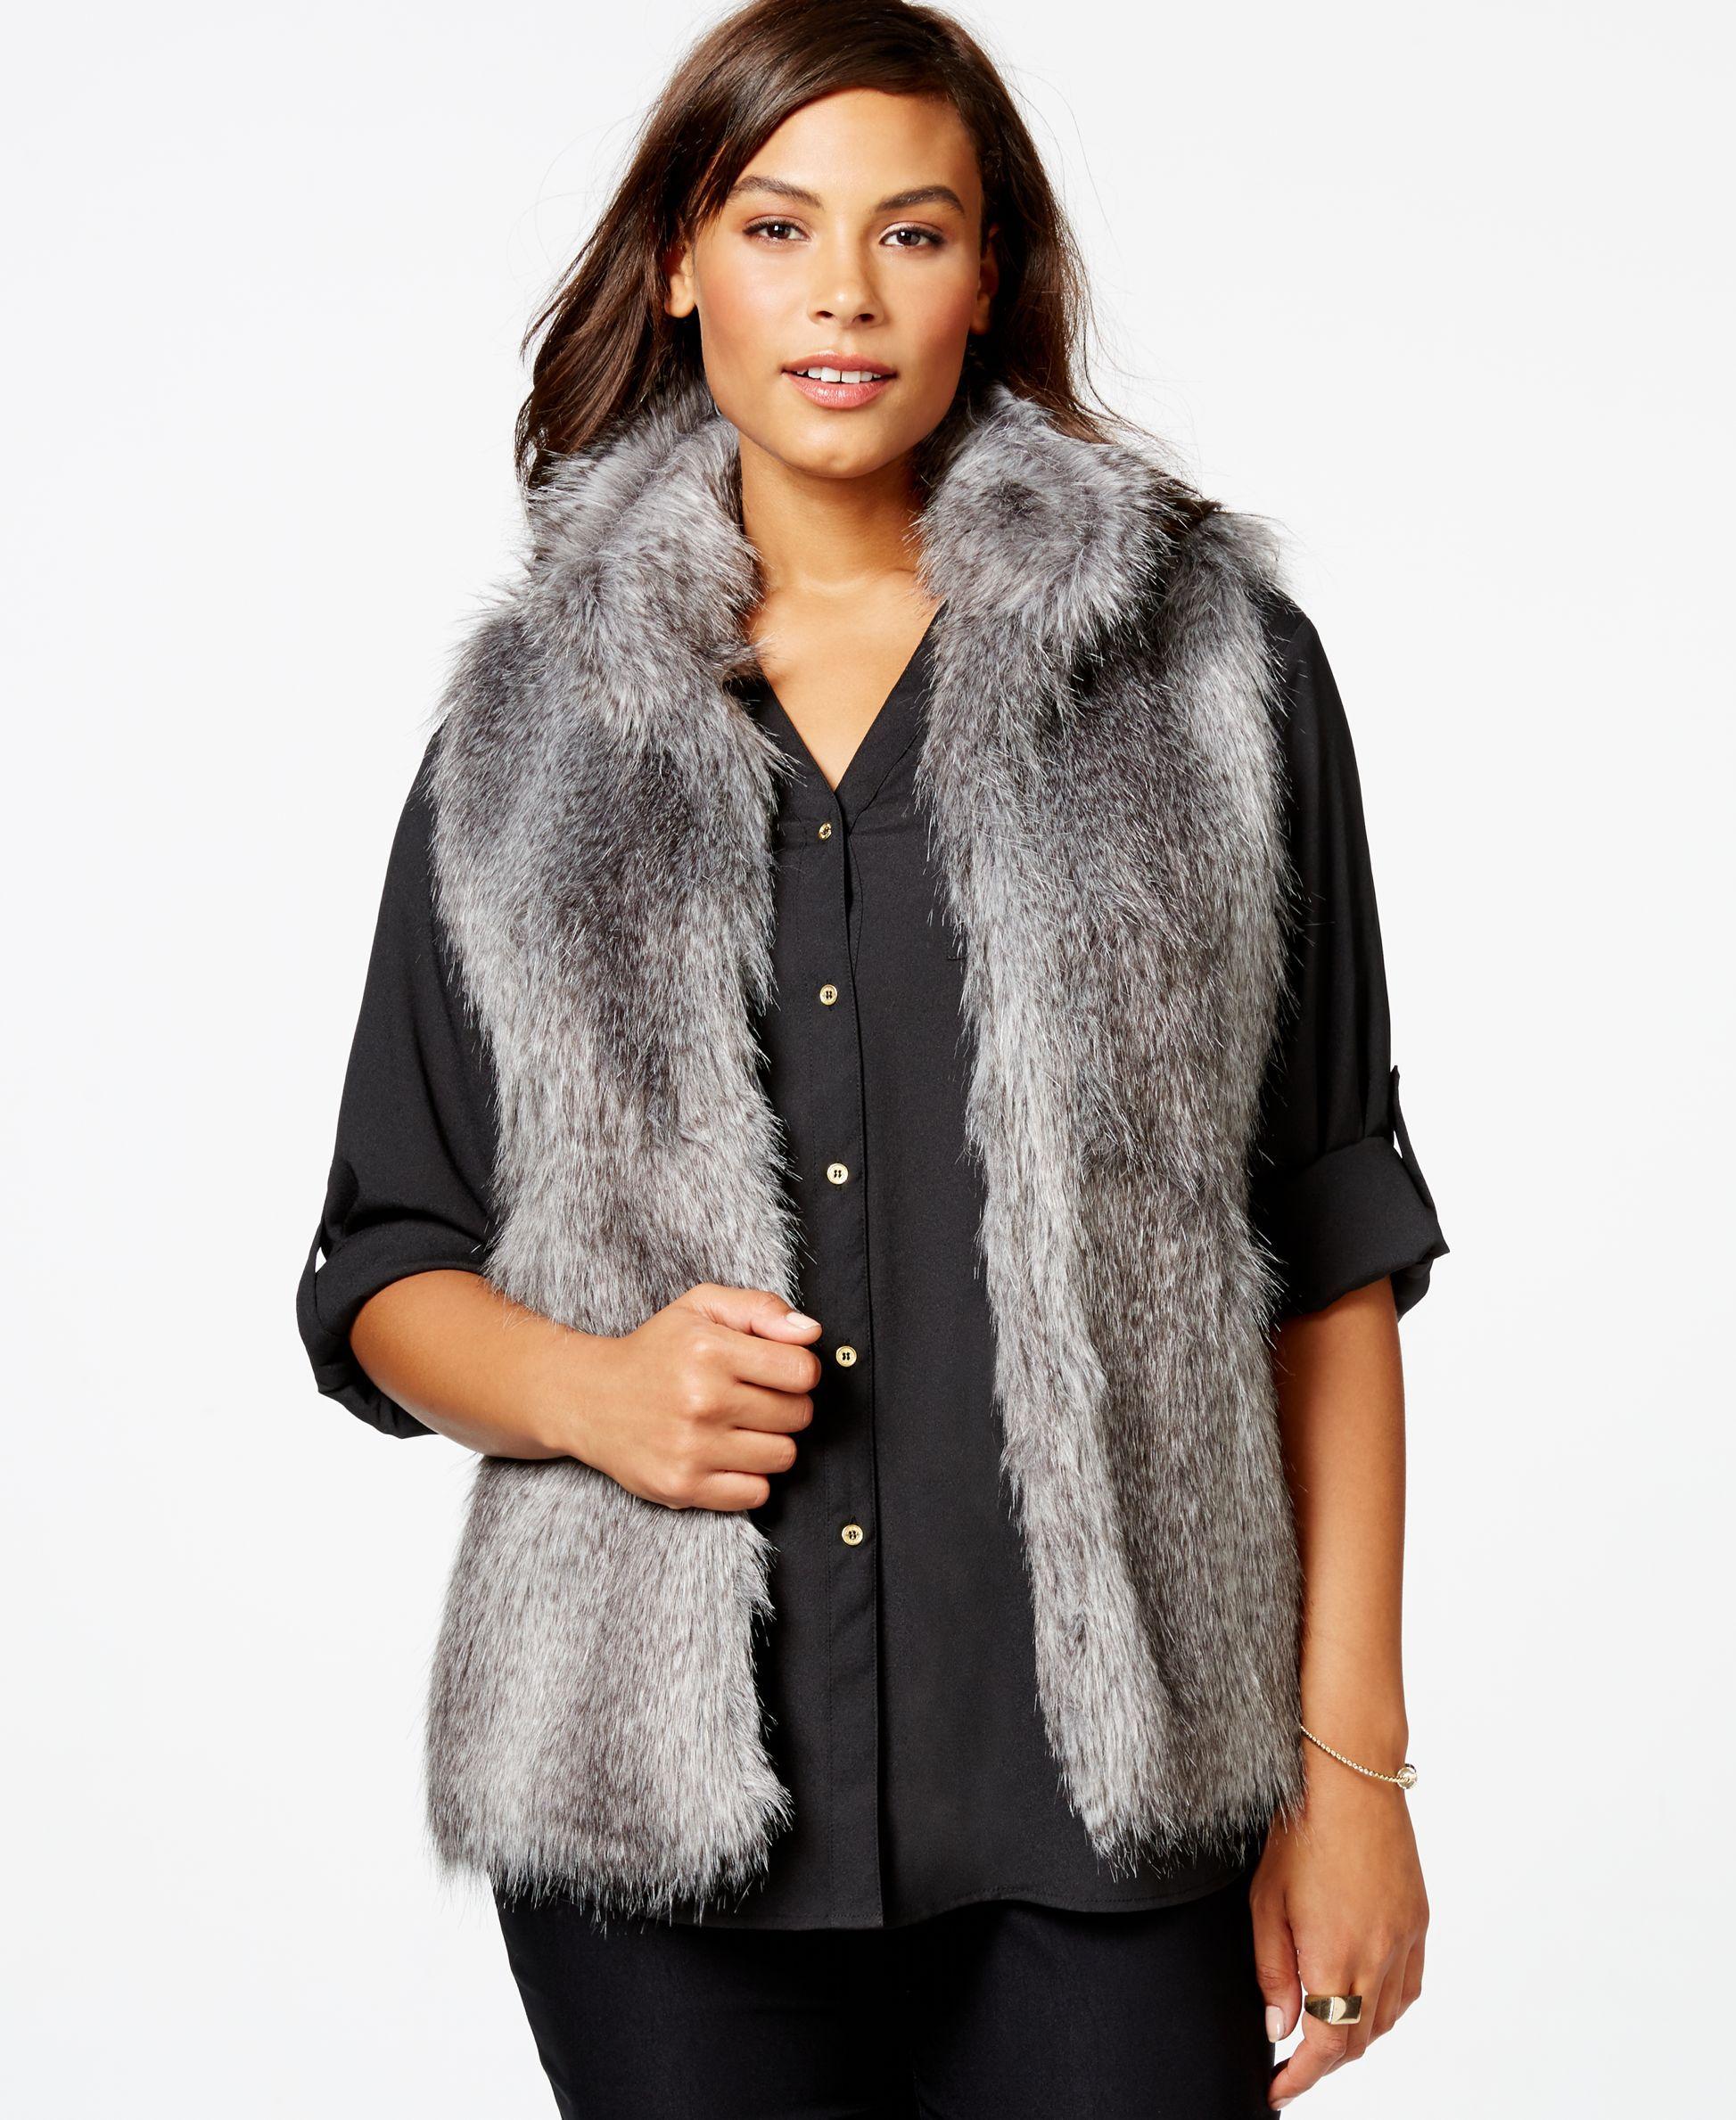 Red flannel vest womens  Dunjakke  Hej  Pinterest  Coats and Rain